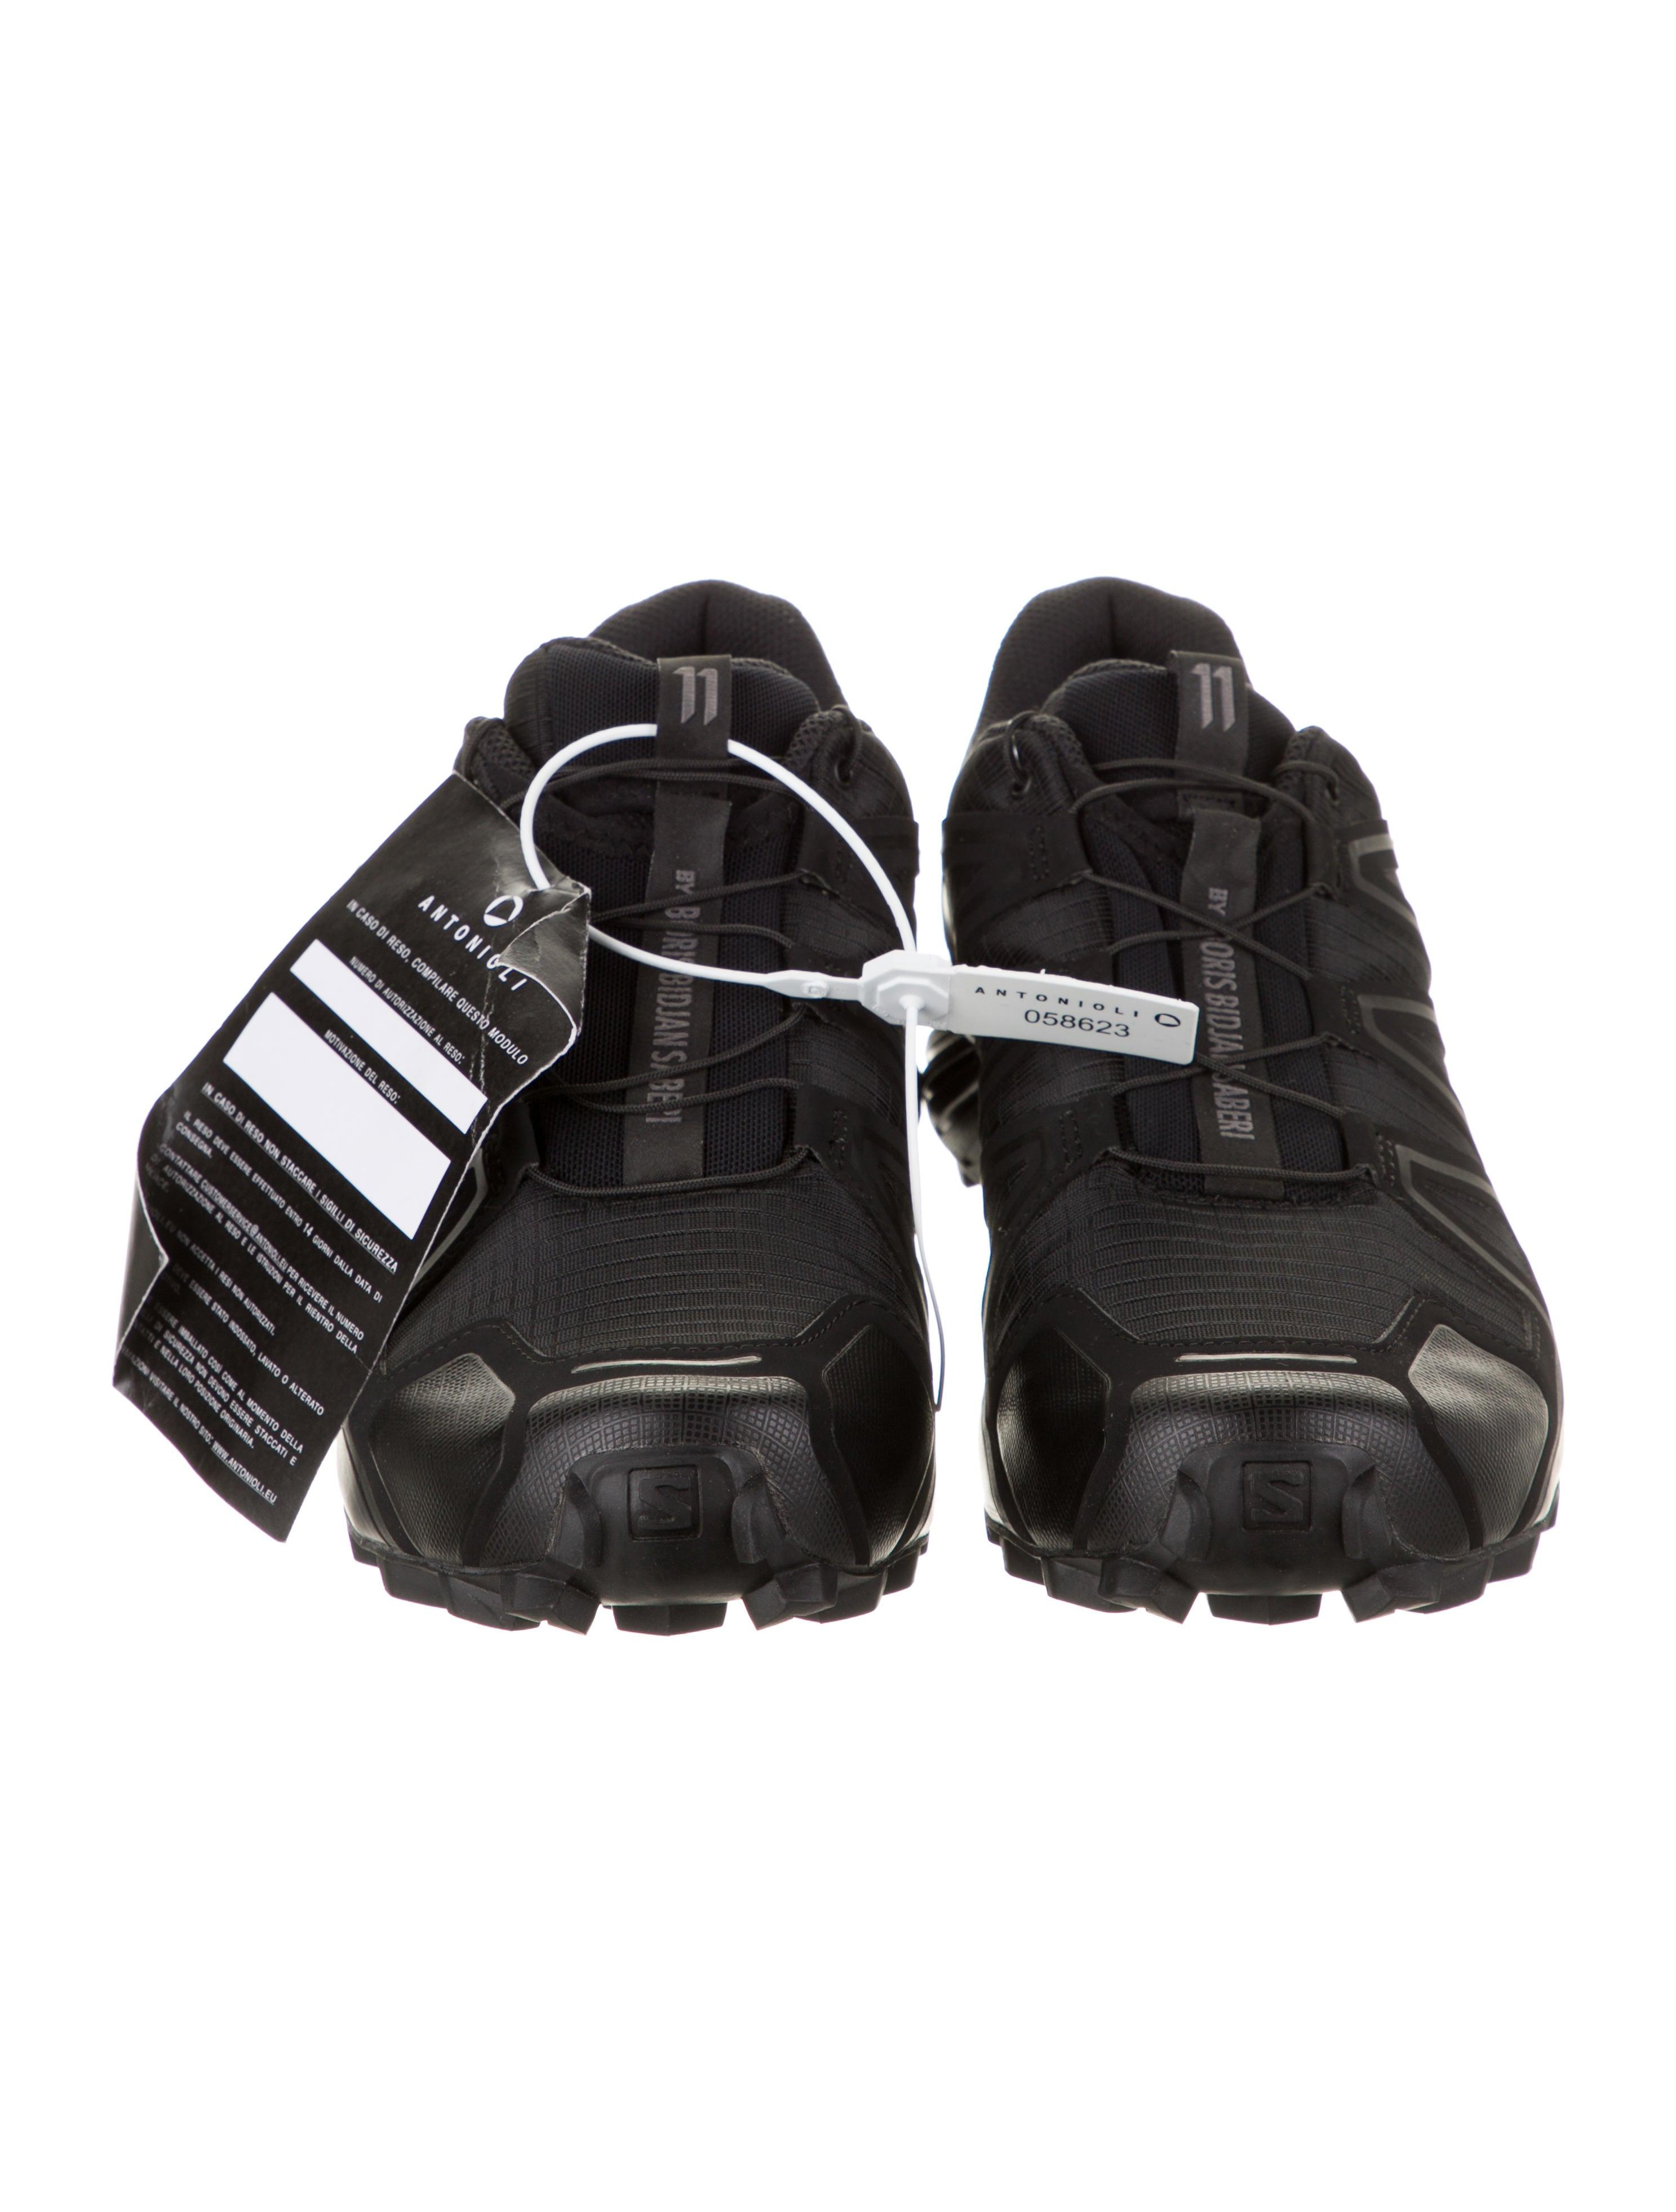 11 by Boris Bidjan Saberi x Salomon Speed Cross 4 Sneakers